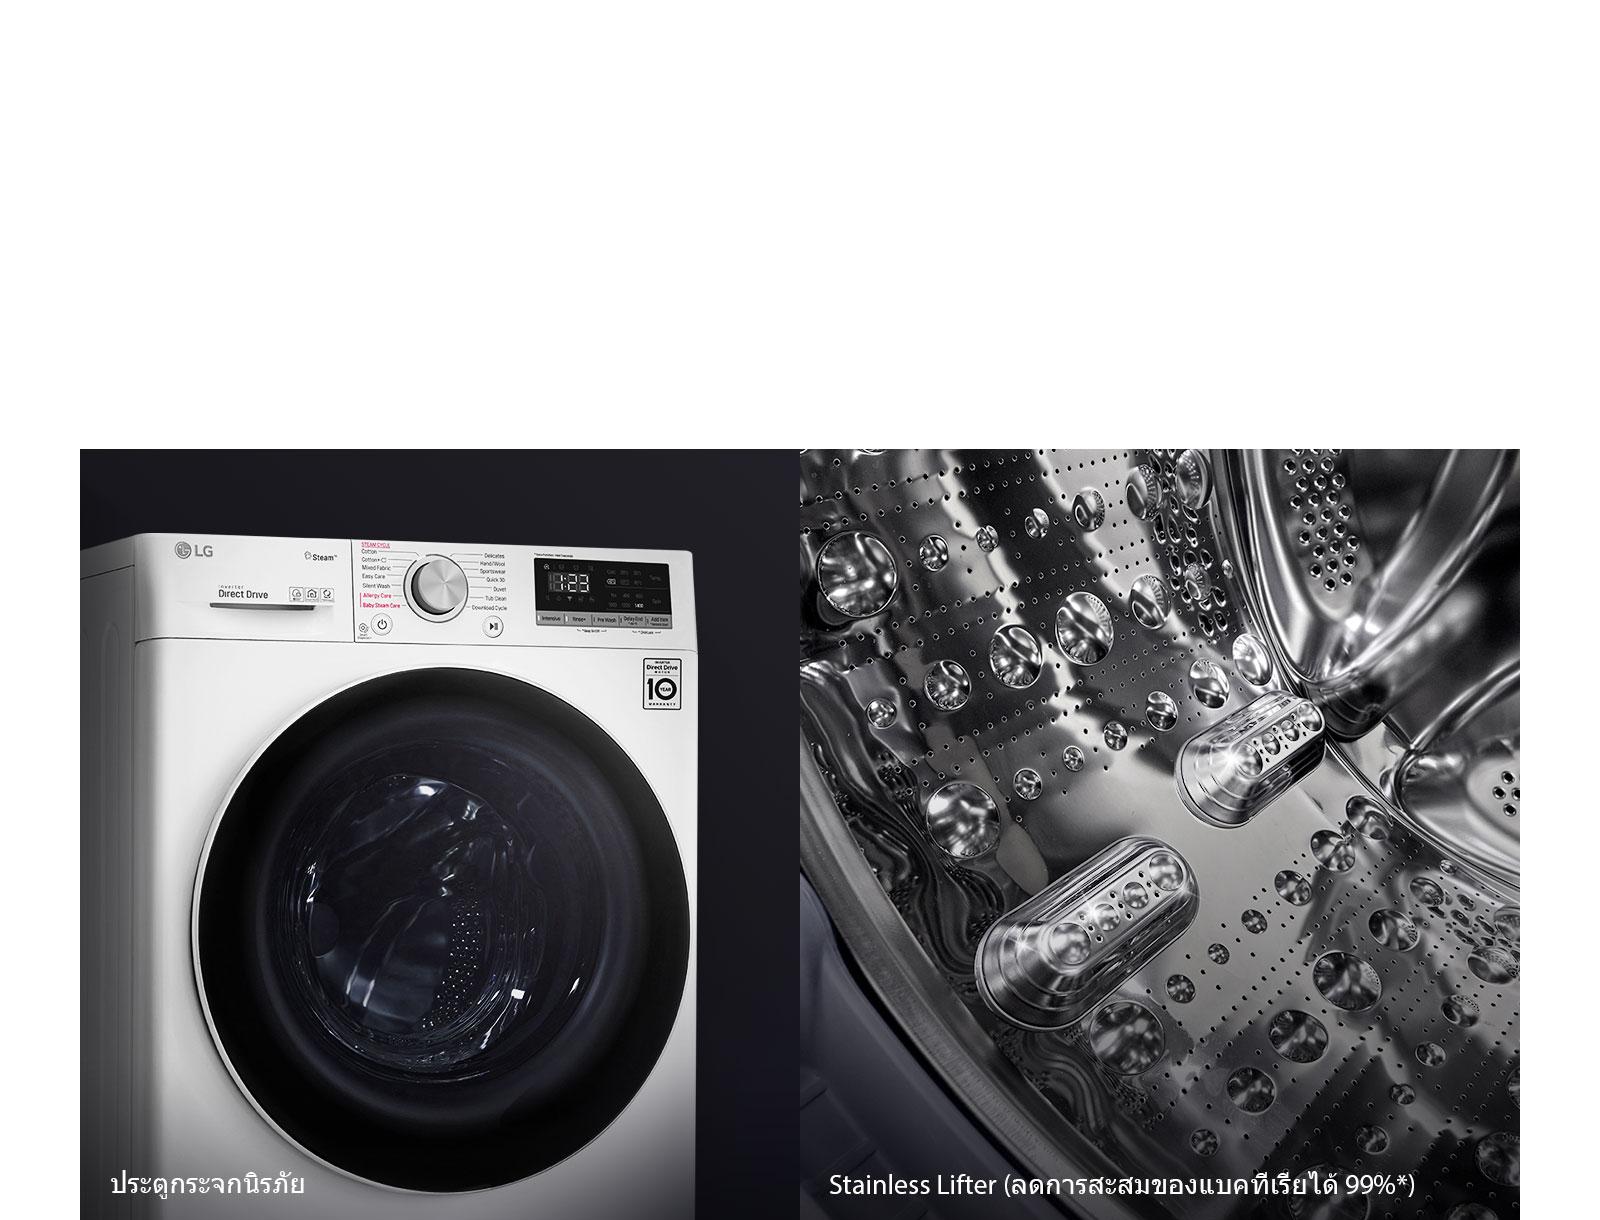 WM-Vivace-V500-VC4-White-06-1-Druability-Desktop-vv1